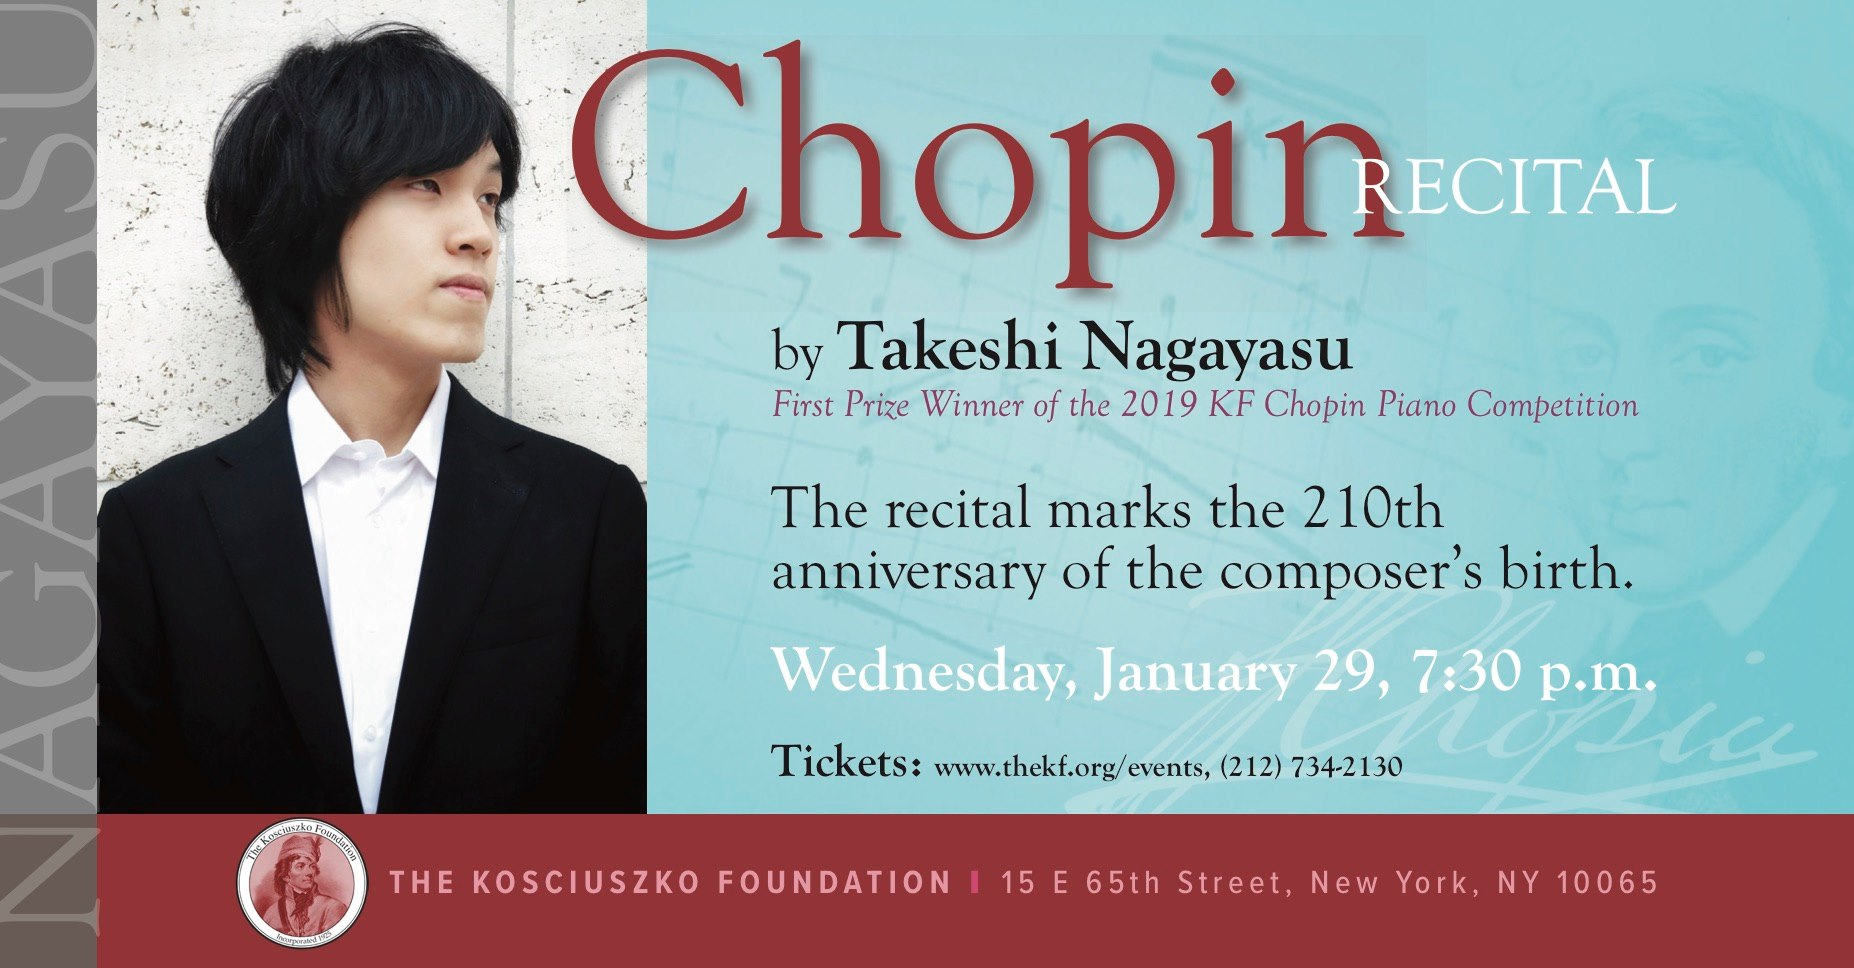 A Chopin Recital by Takeshi Nagayasu at the Kosciuszko Foundation in NYC